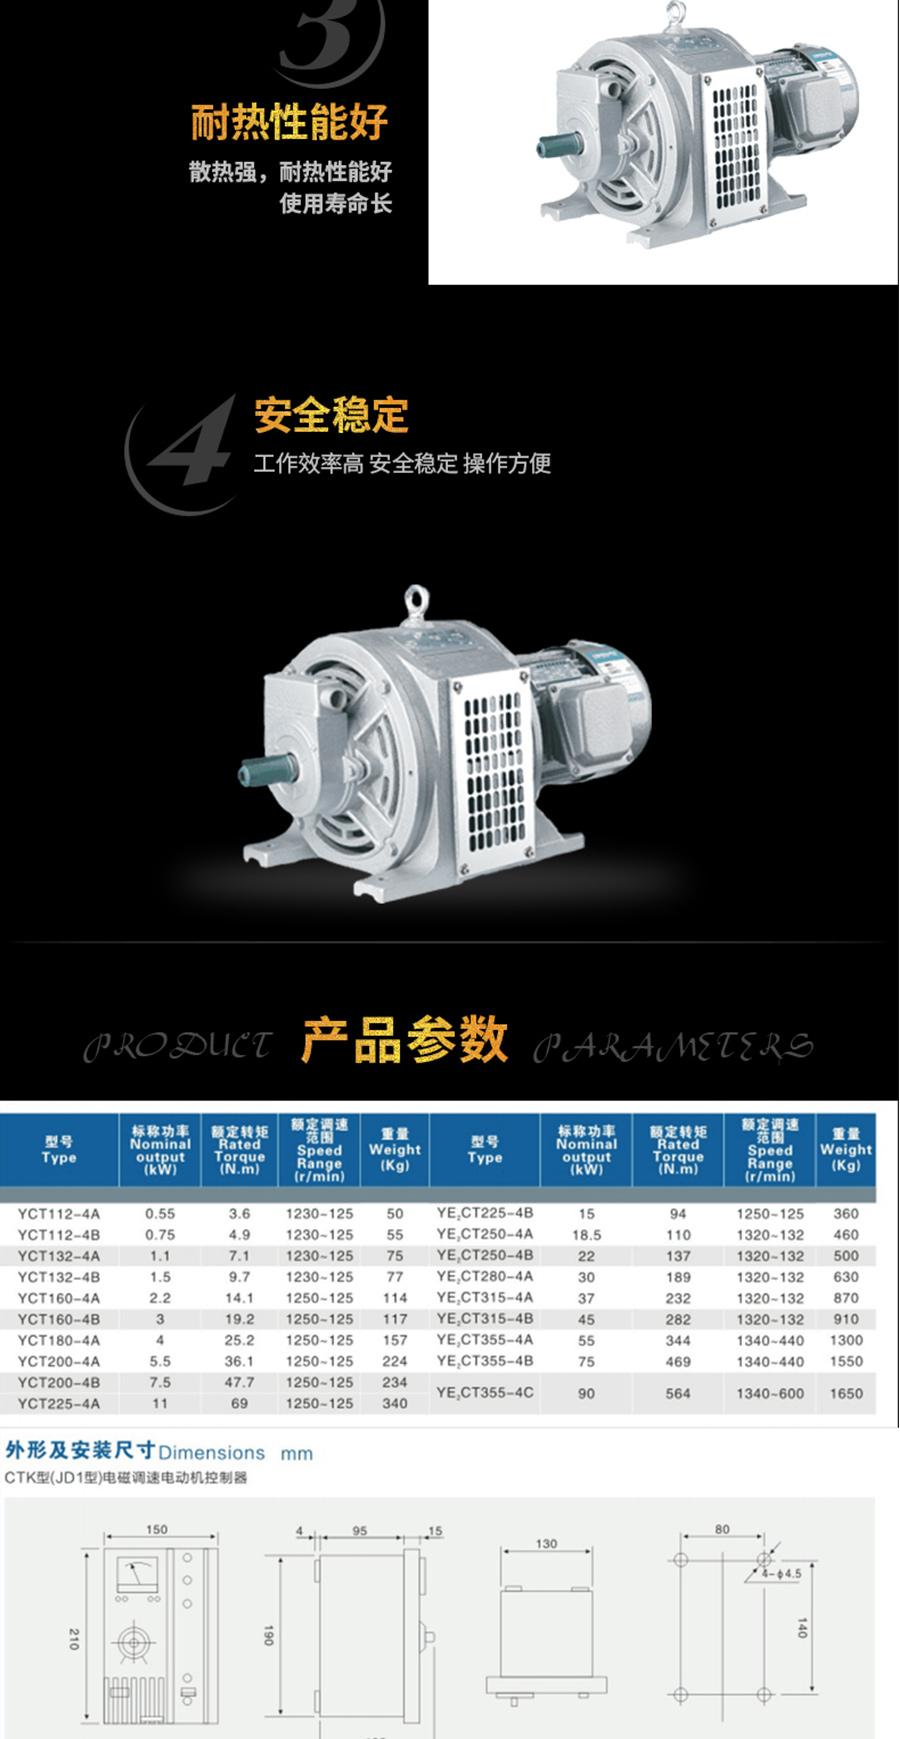 YCT-112-4A型号电机安装和尺寸与外形尺寸图3